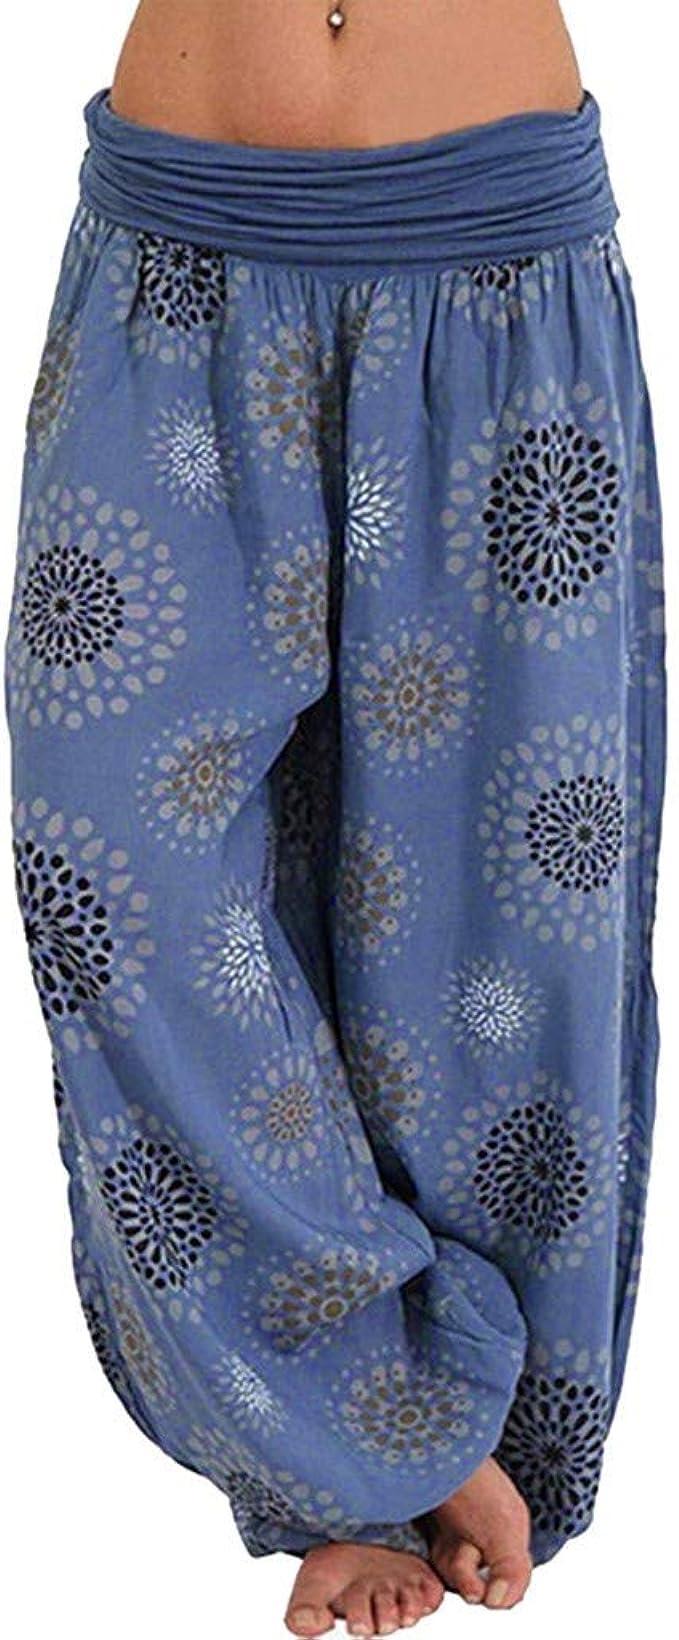 Adeliber Womens Pants Fashion Printing Bandwidth Loose Yoga Pants Womens Casual Sweatpants